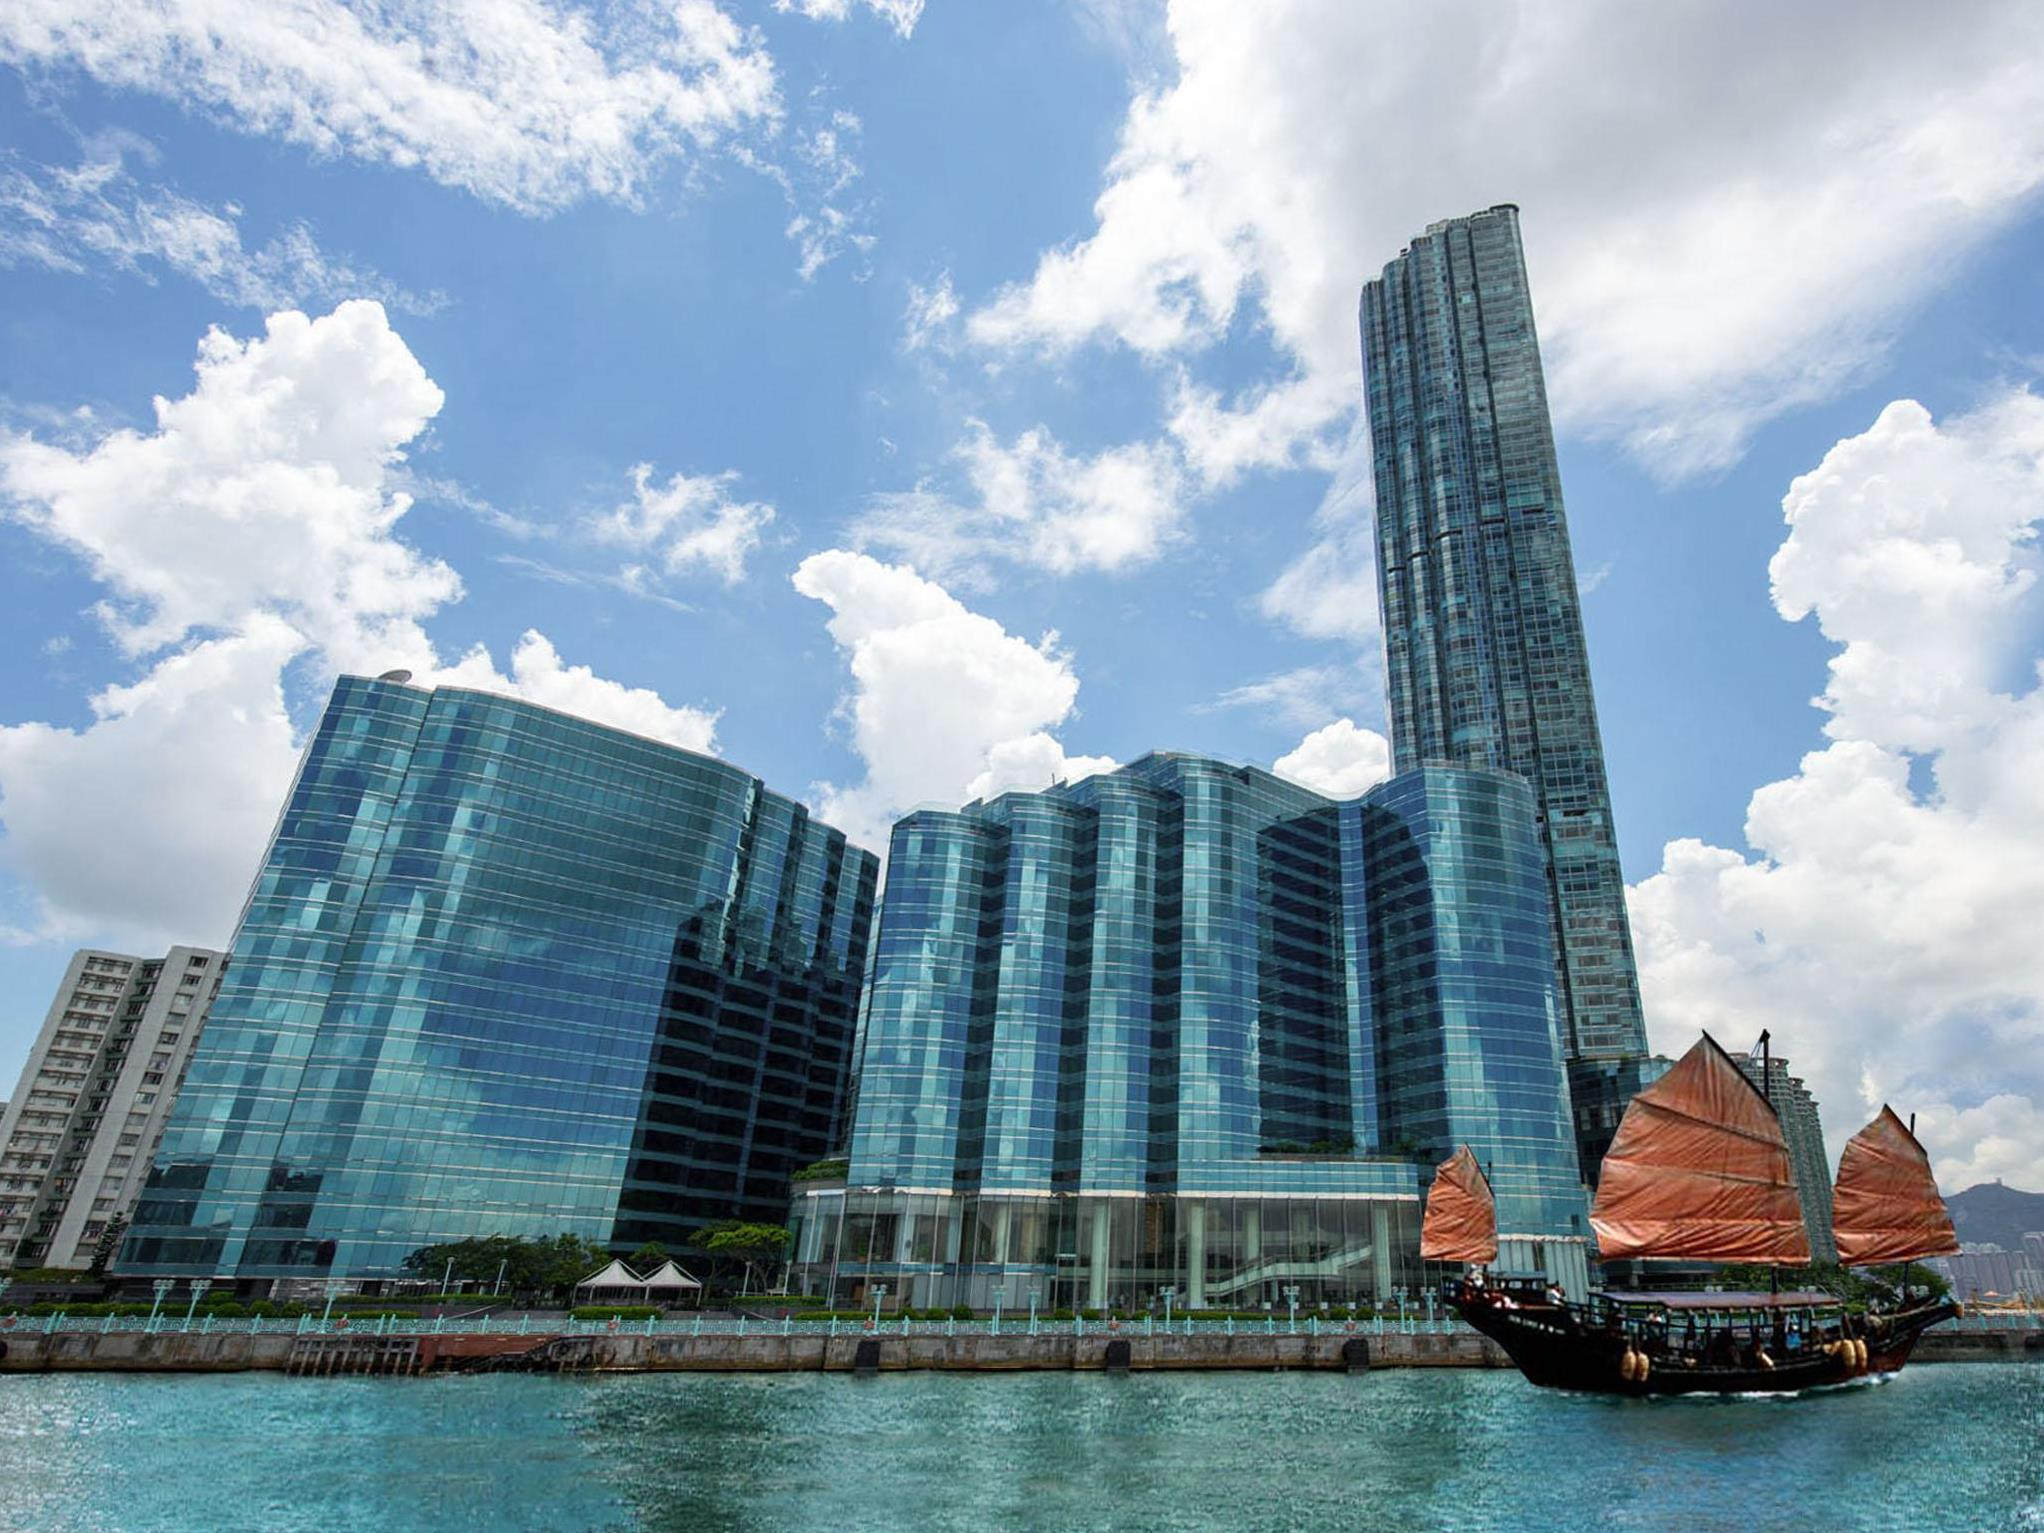 Harbour Grand Kowloon Hotel (Hong Kong) - Deals. Photos & Reviews